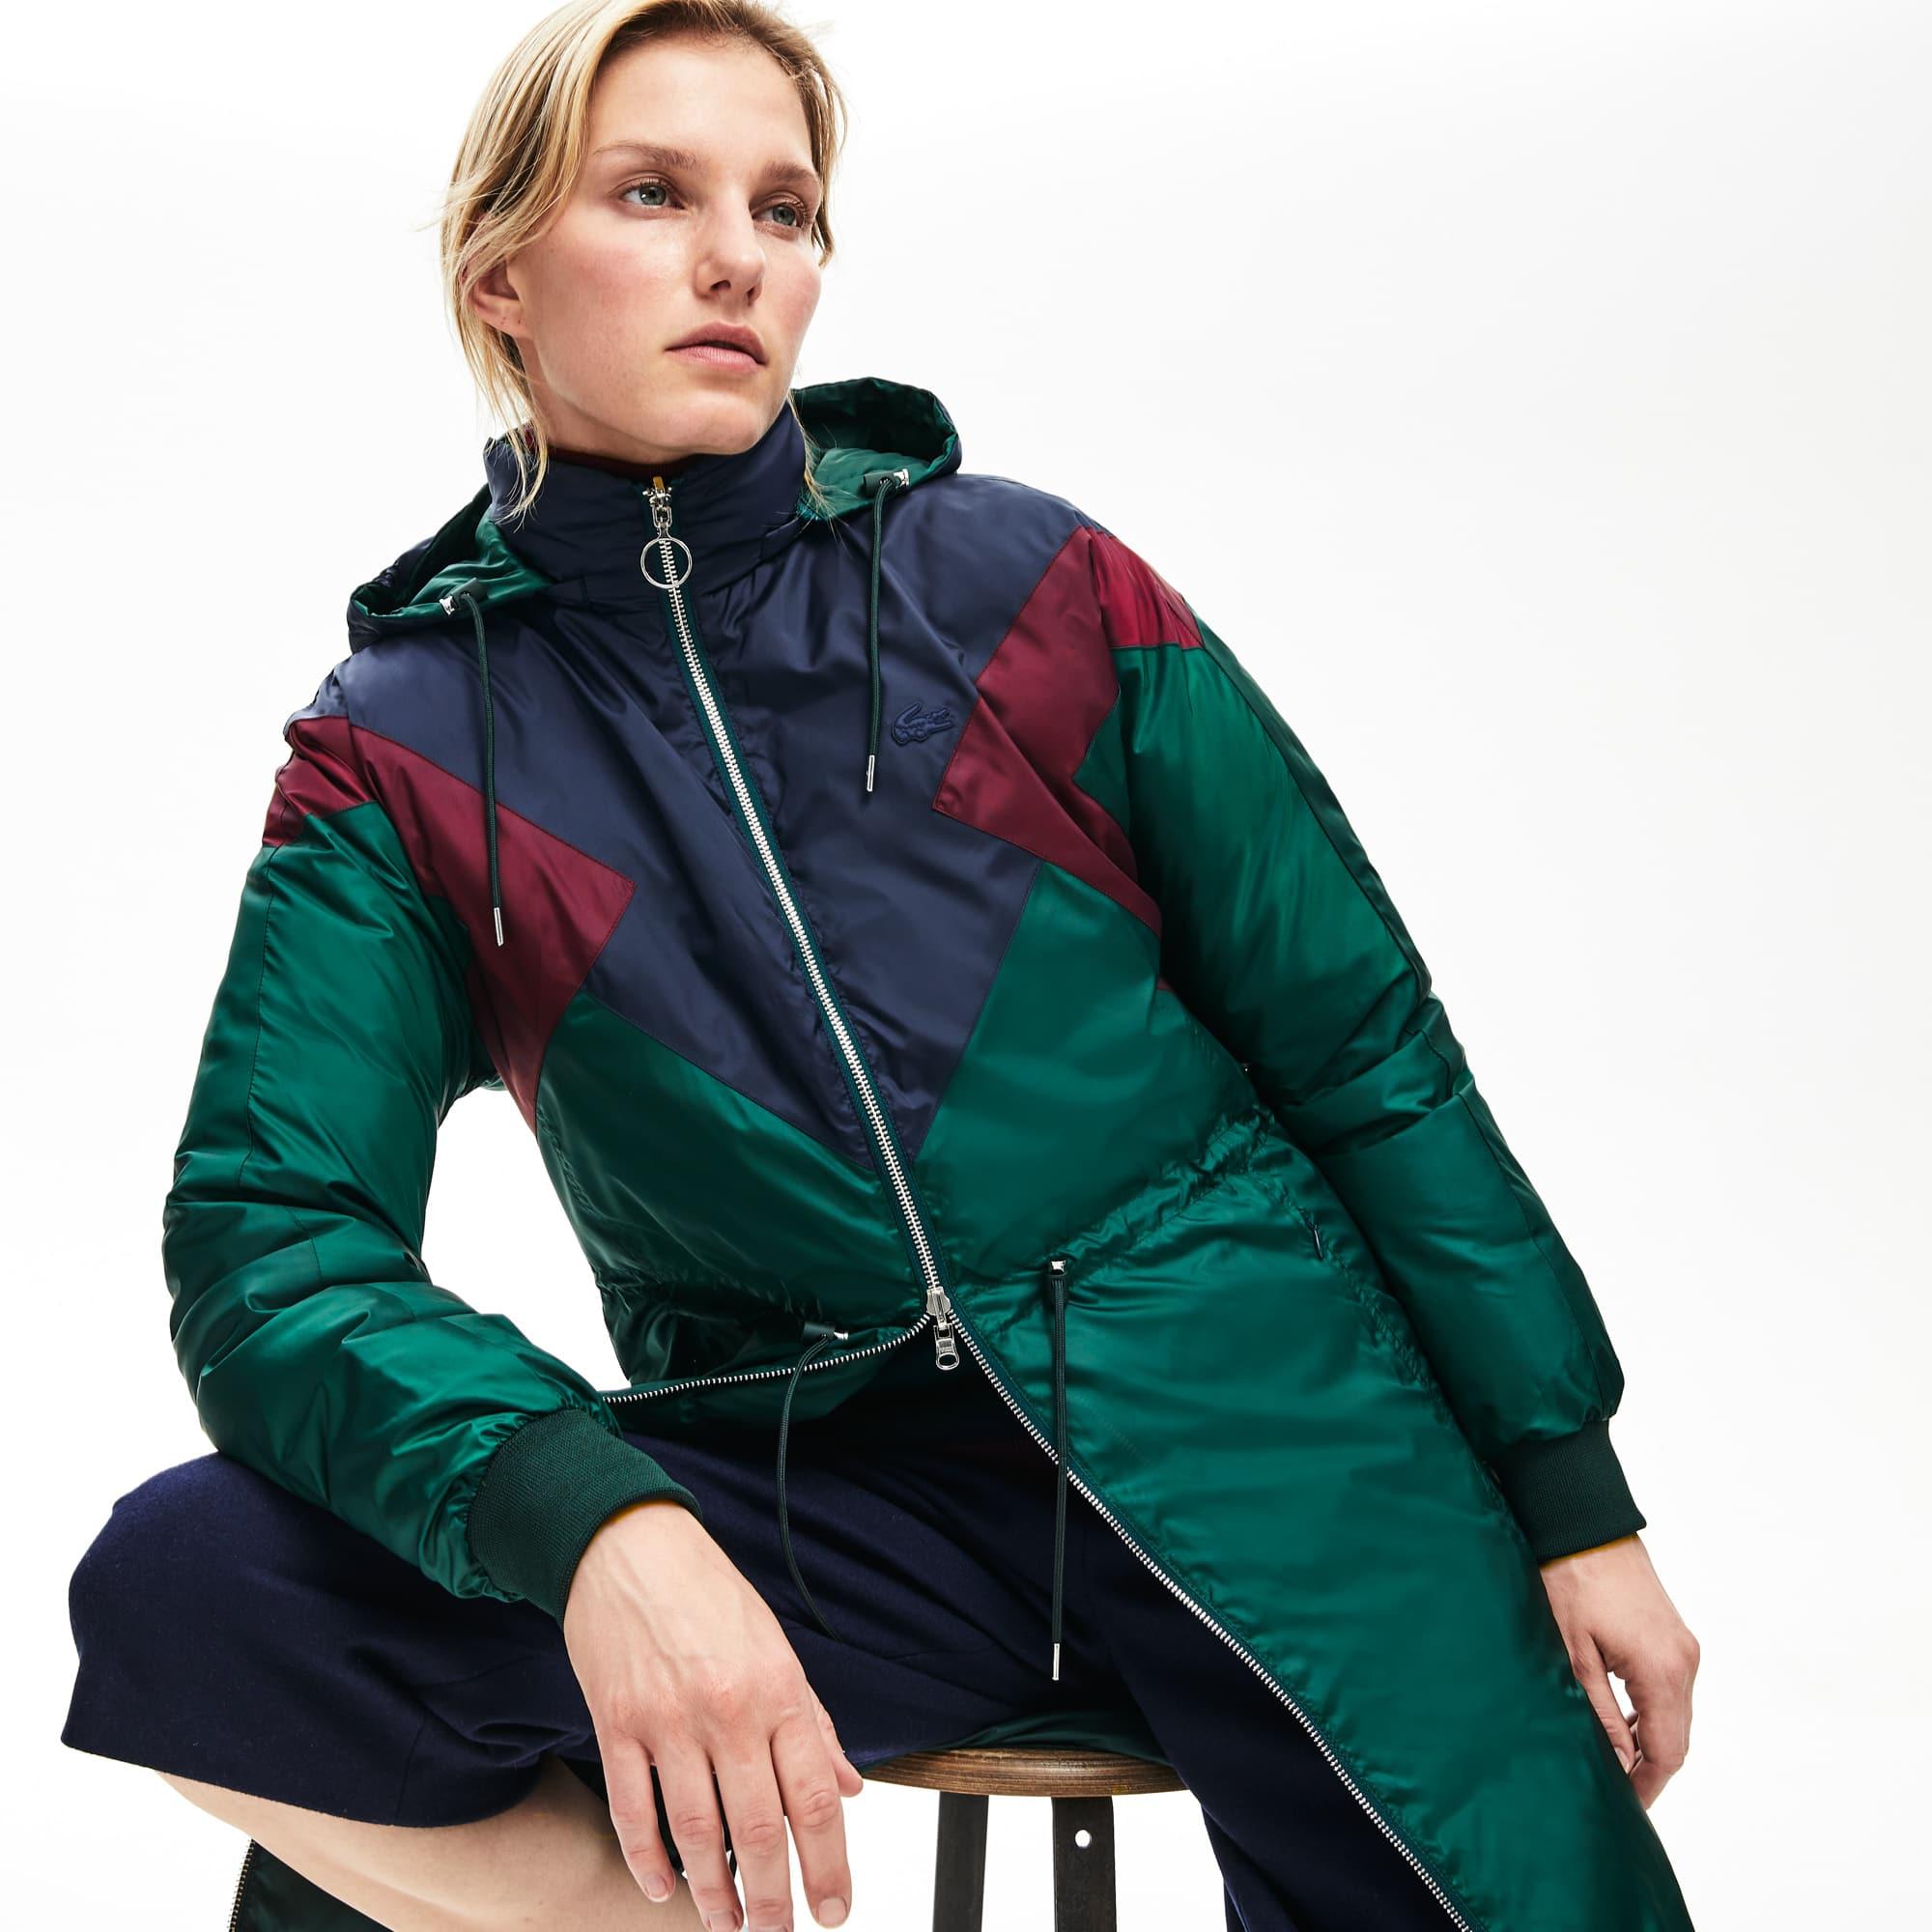 Lacoste Coats Women's Reversible Color-Blocked Water-Resistant Long Quilted Coat